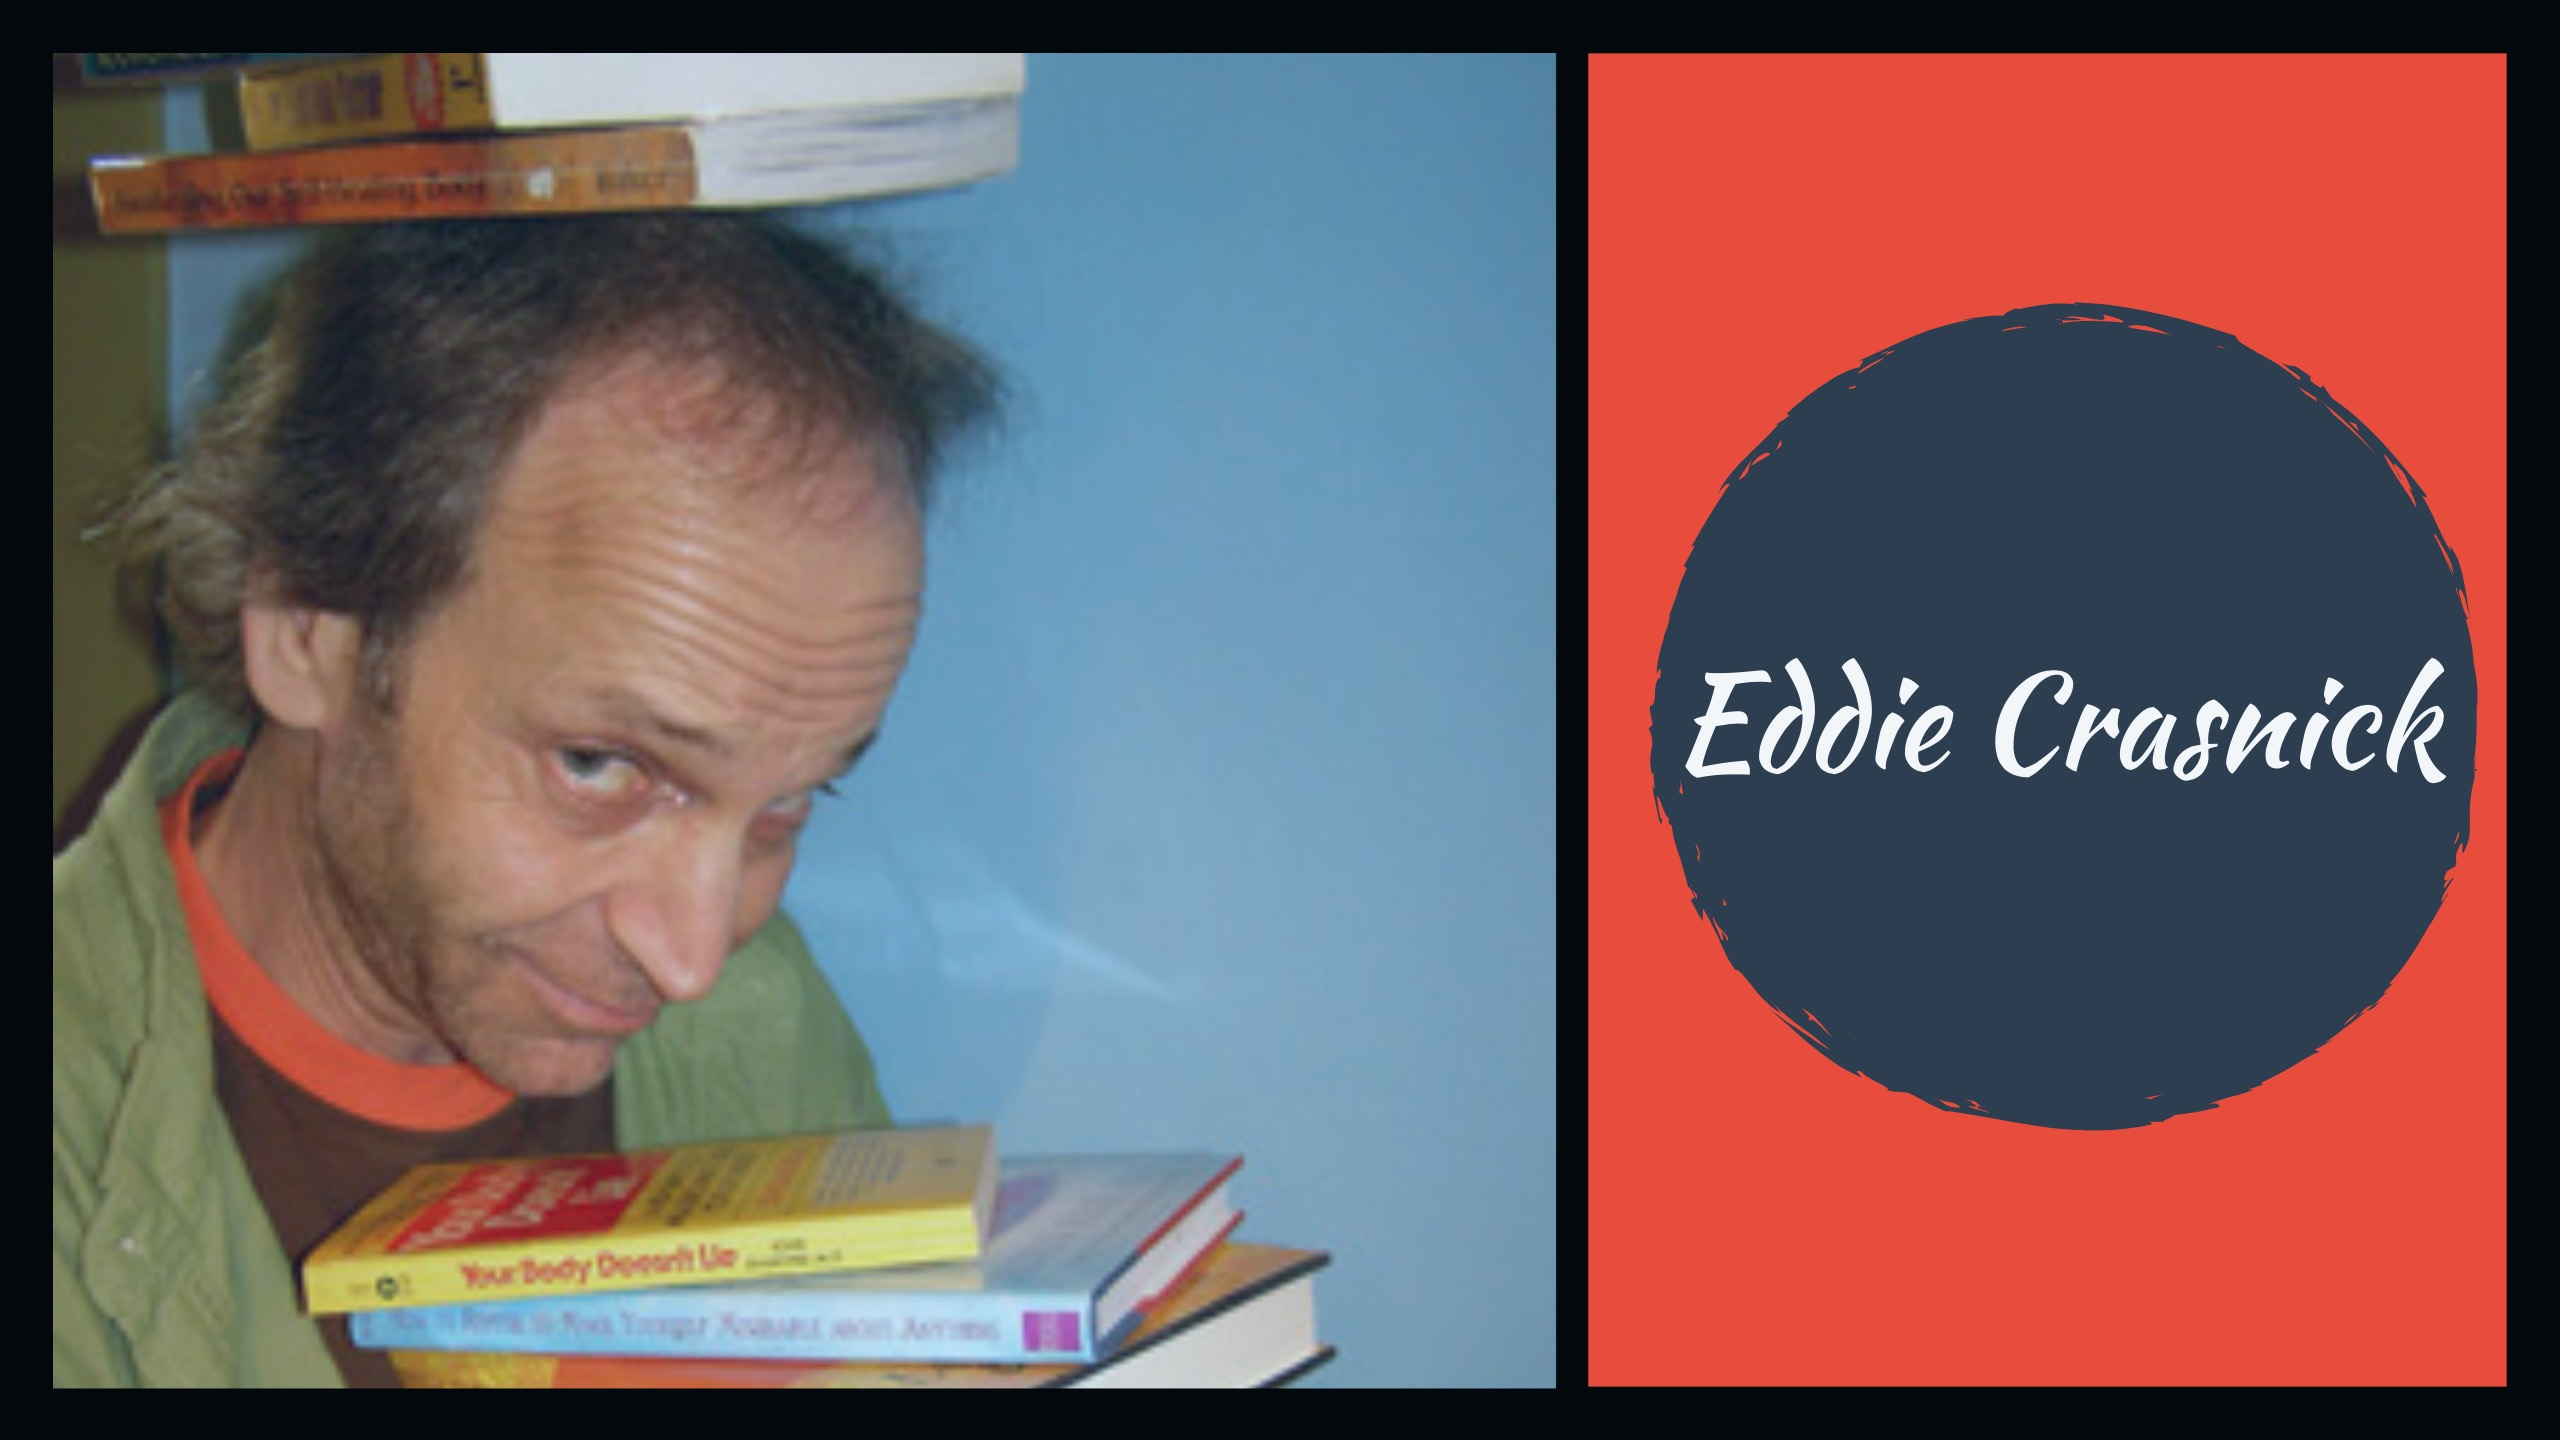 eddie crasnick deals with anger